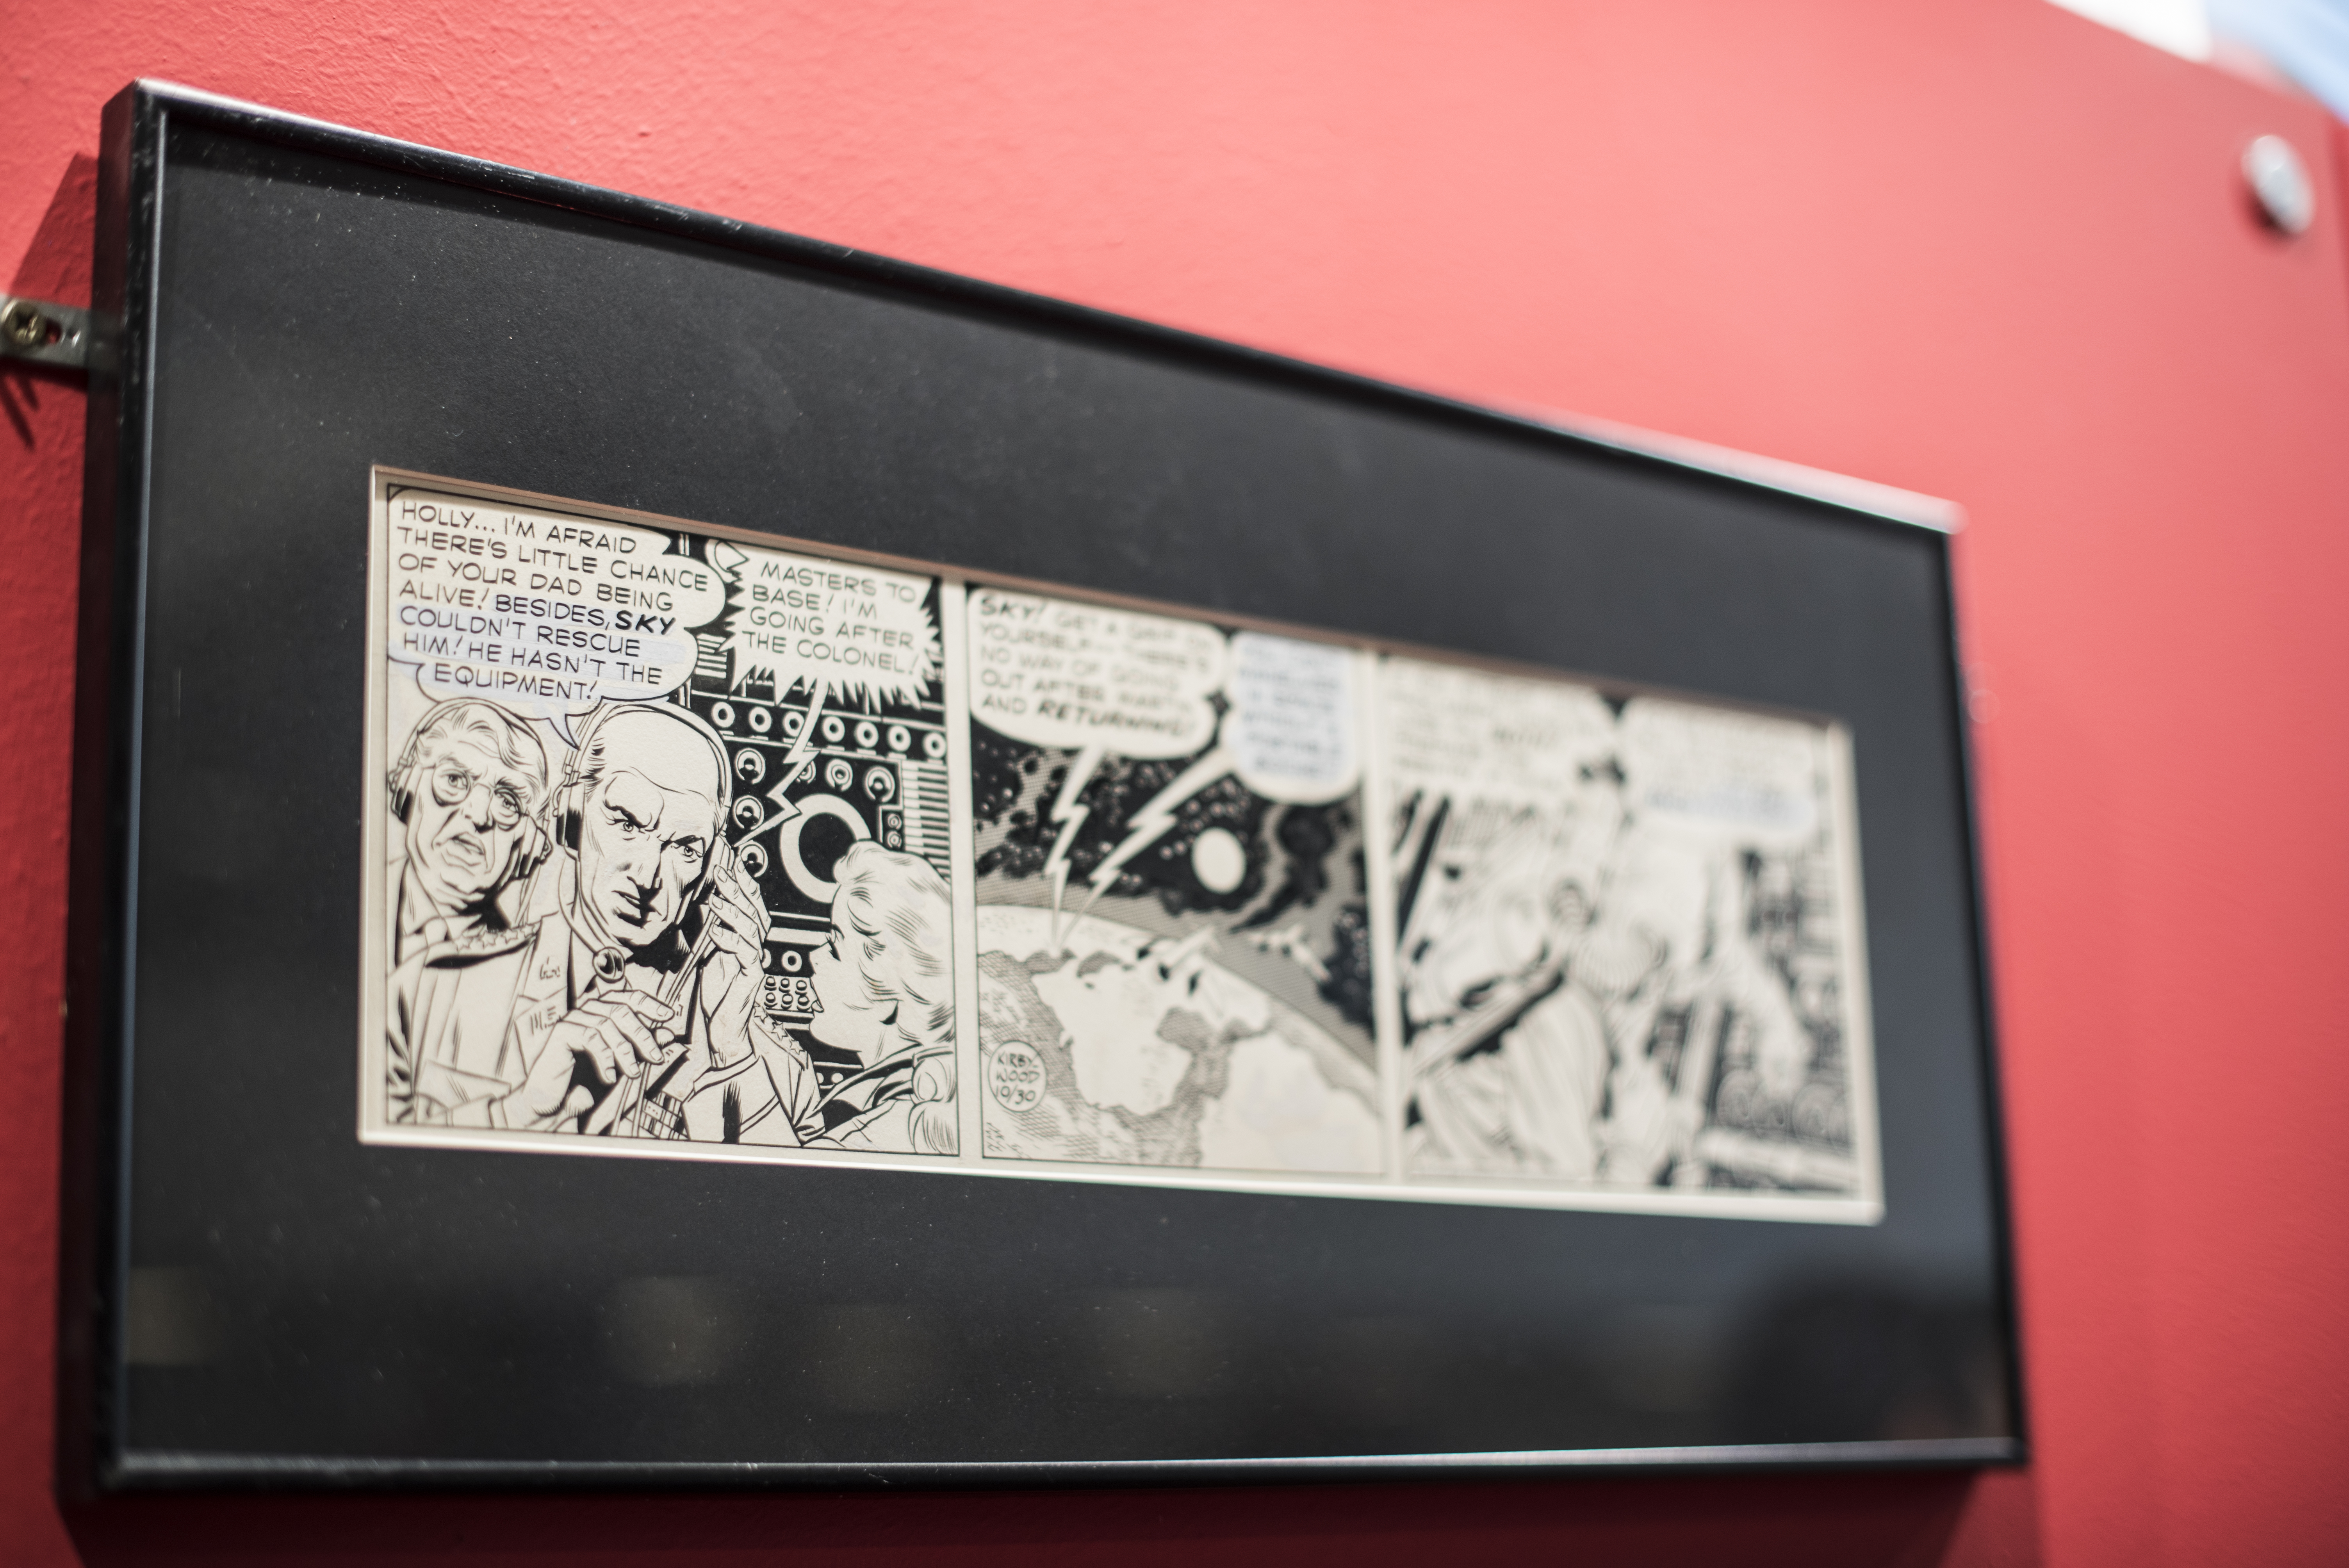 Expo de Jack Kirby, the King of Comics